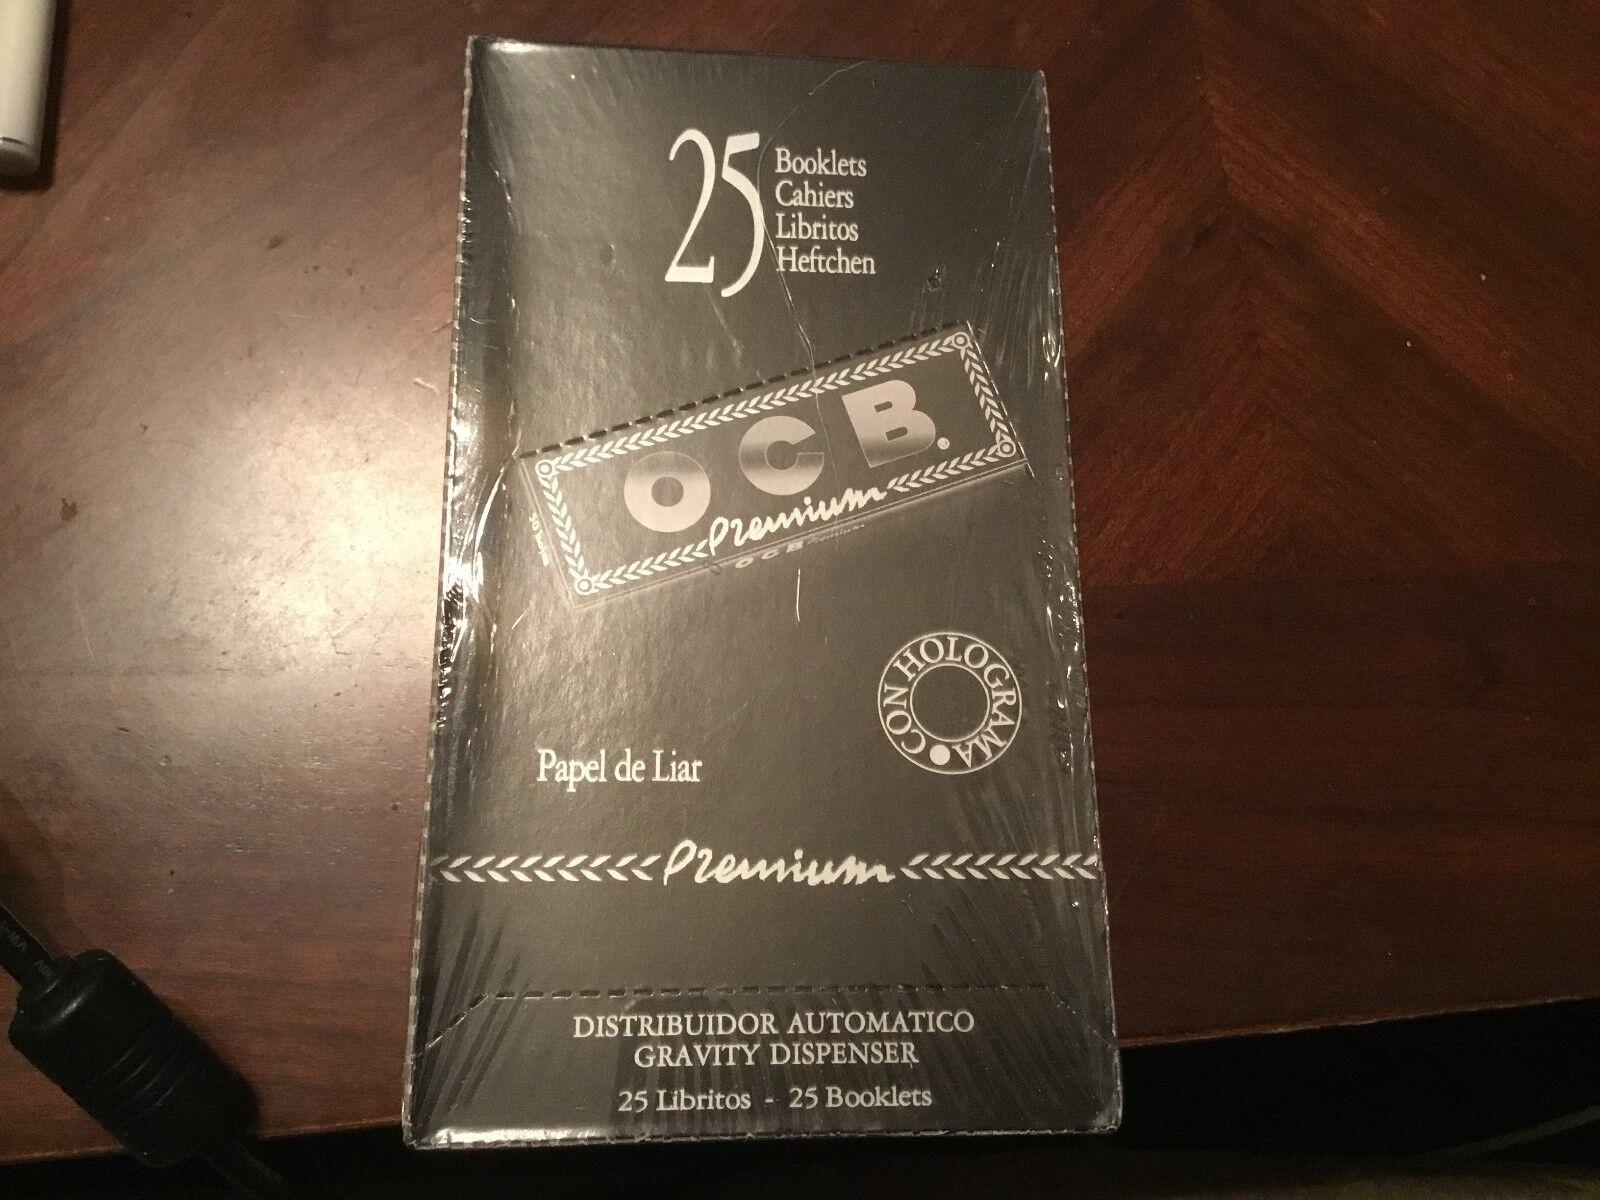 OCB Premium Black(24 Packs/50 leaves per Pack)box of Rolling Papers 1 1/4*1.25